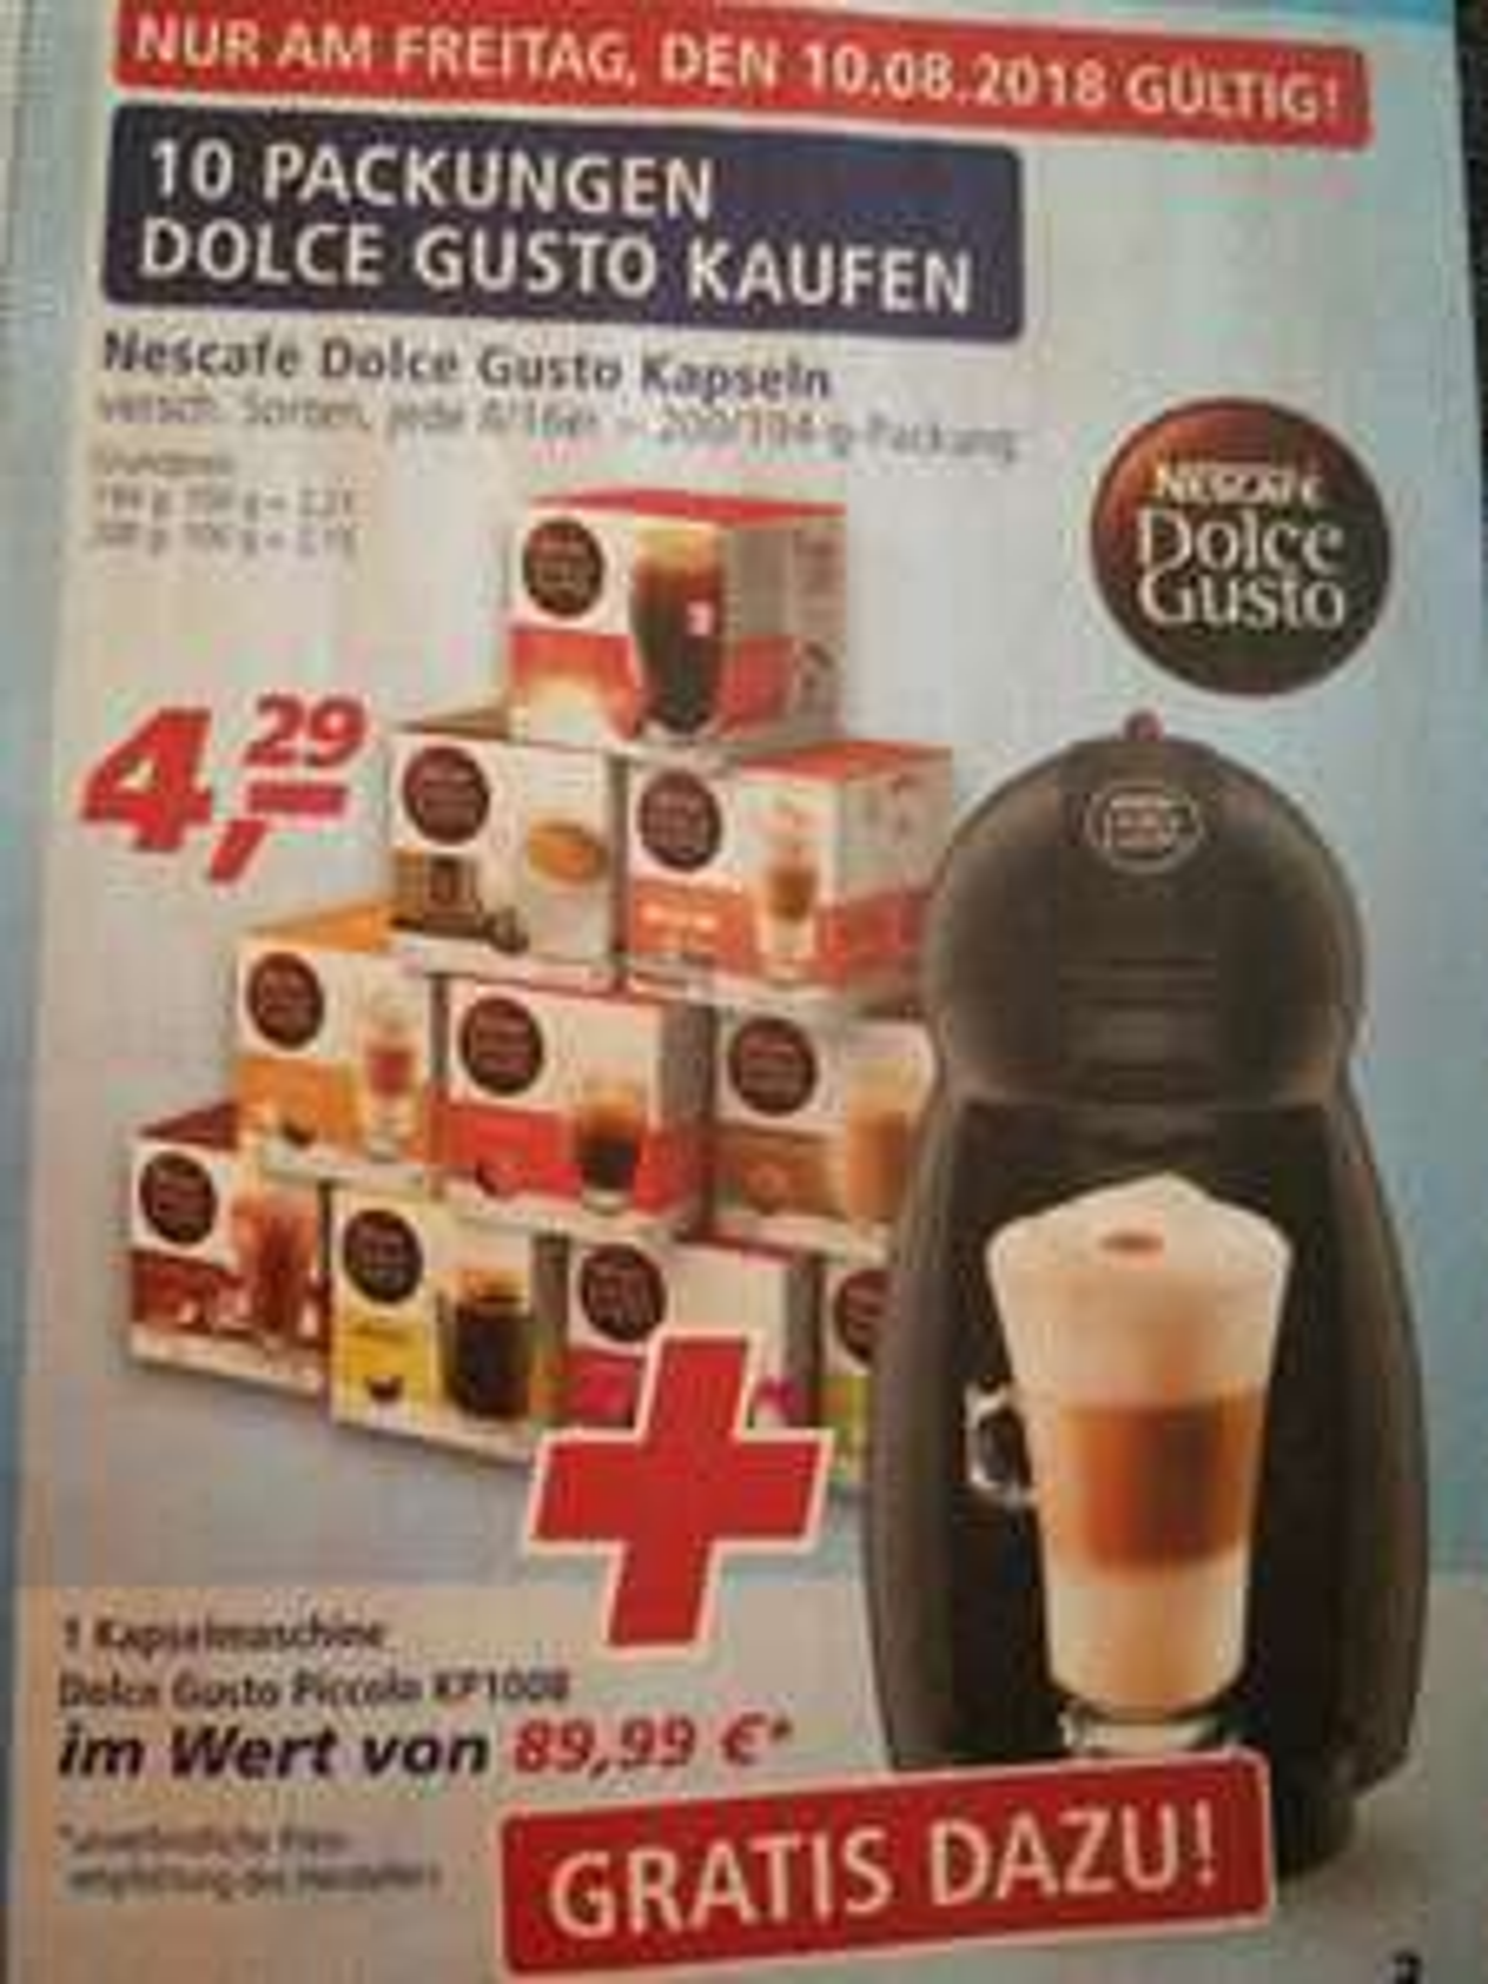 [Real 10.08.2018] Dolce Gusto Kaffeemaschine gratis zu 10 Packungen Kapseln